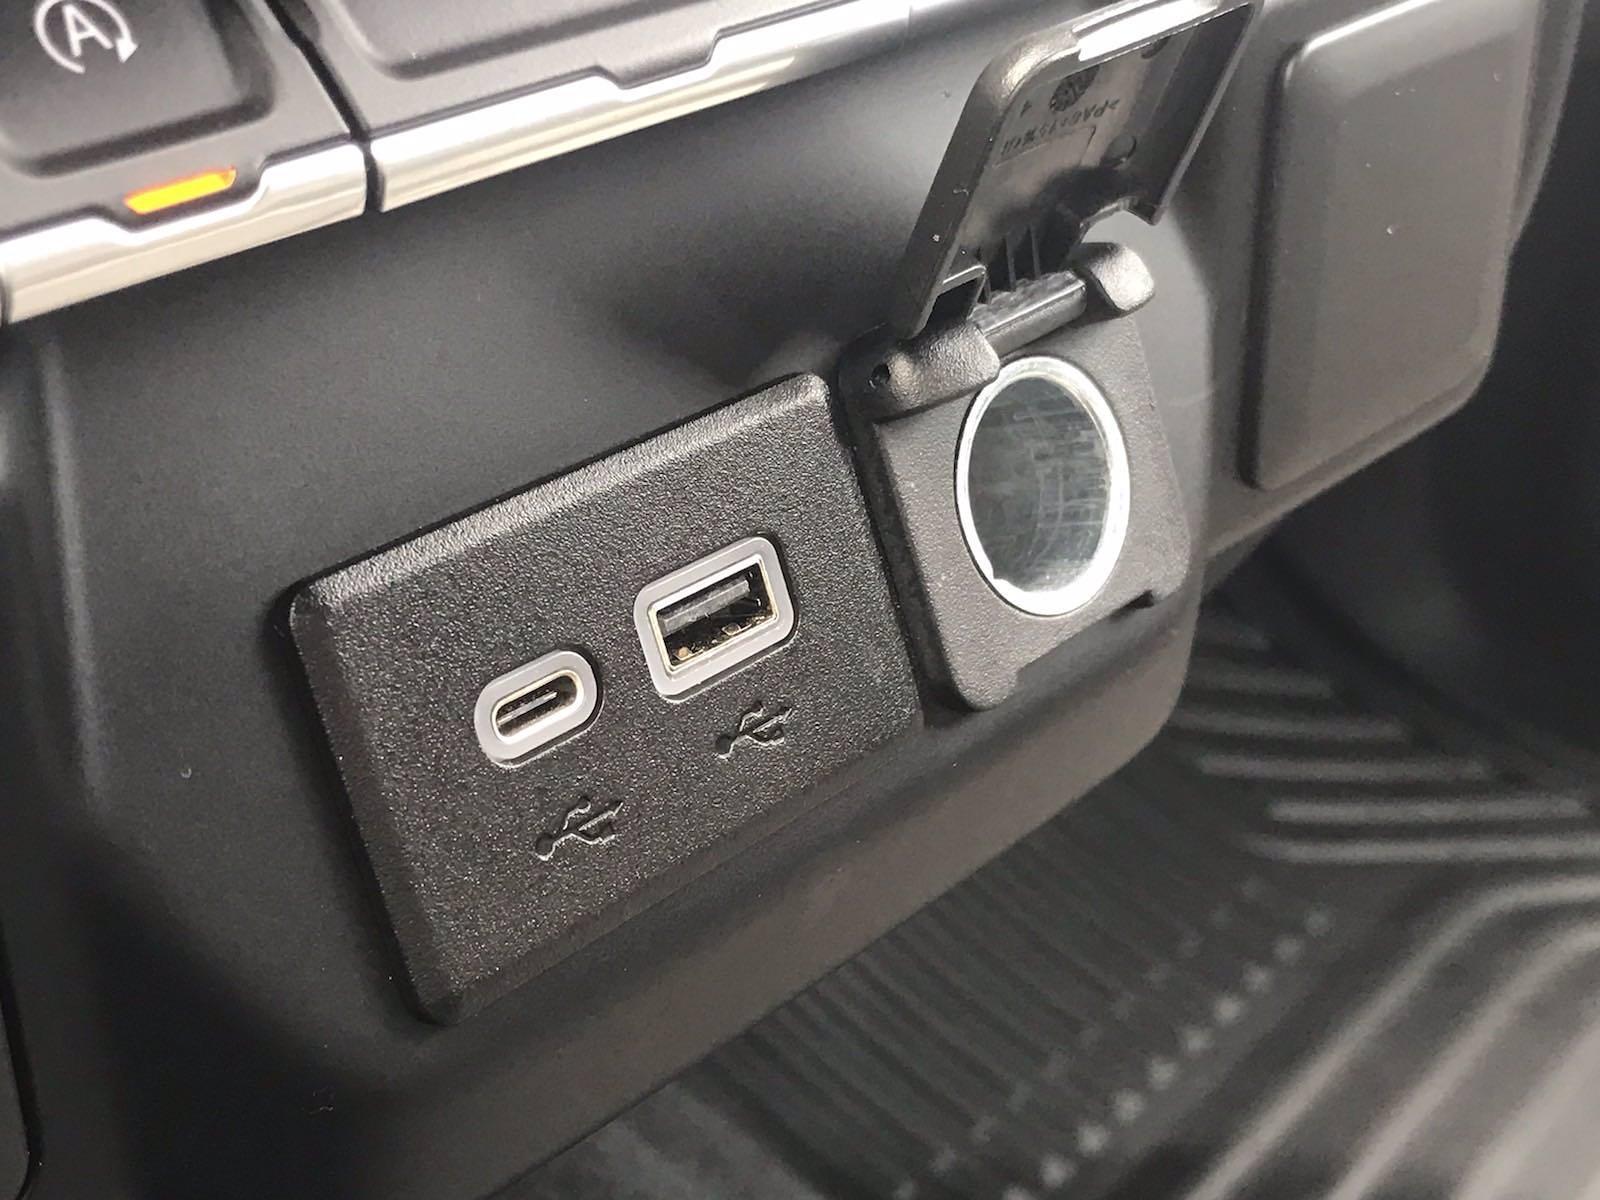 2020 Chevrolet Silverado 1500 Crew Cab 4x4, Pickup #16466PN - photo 37